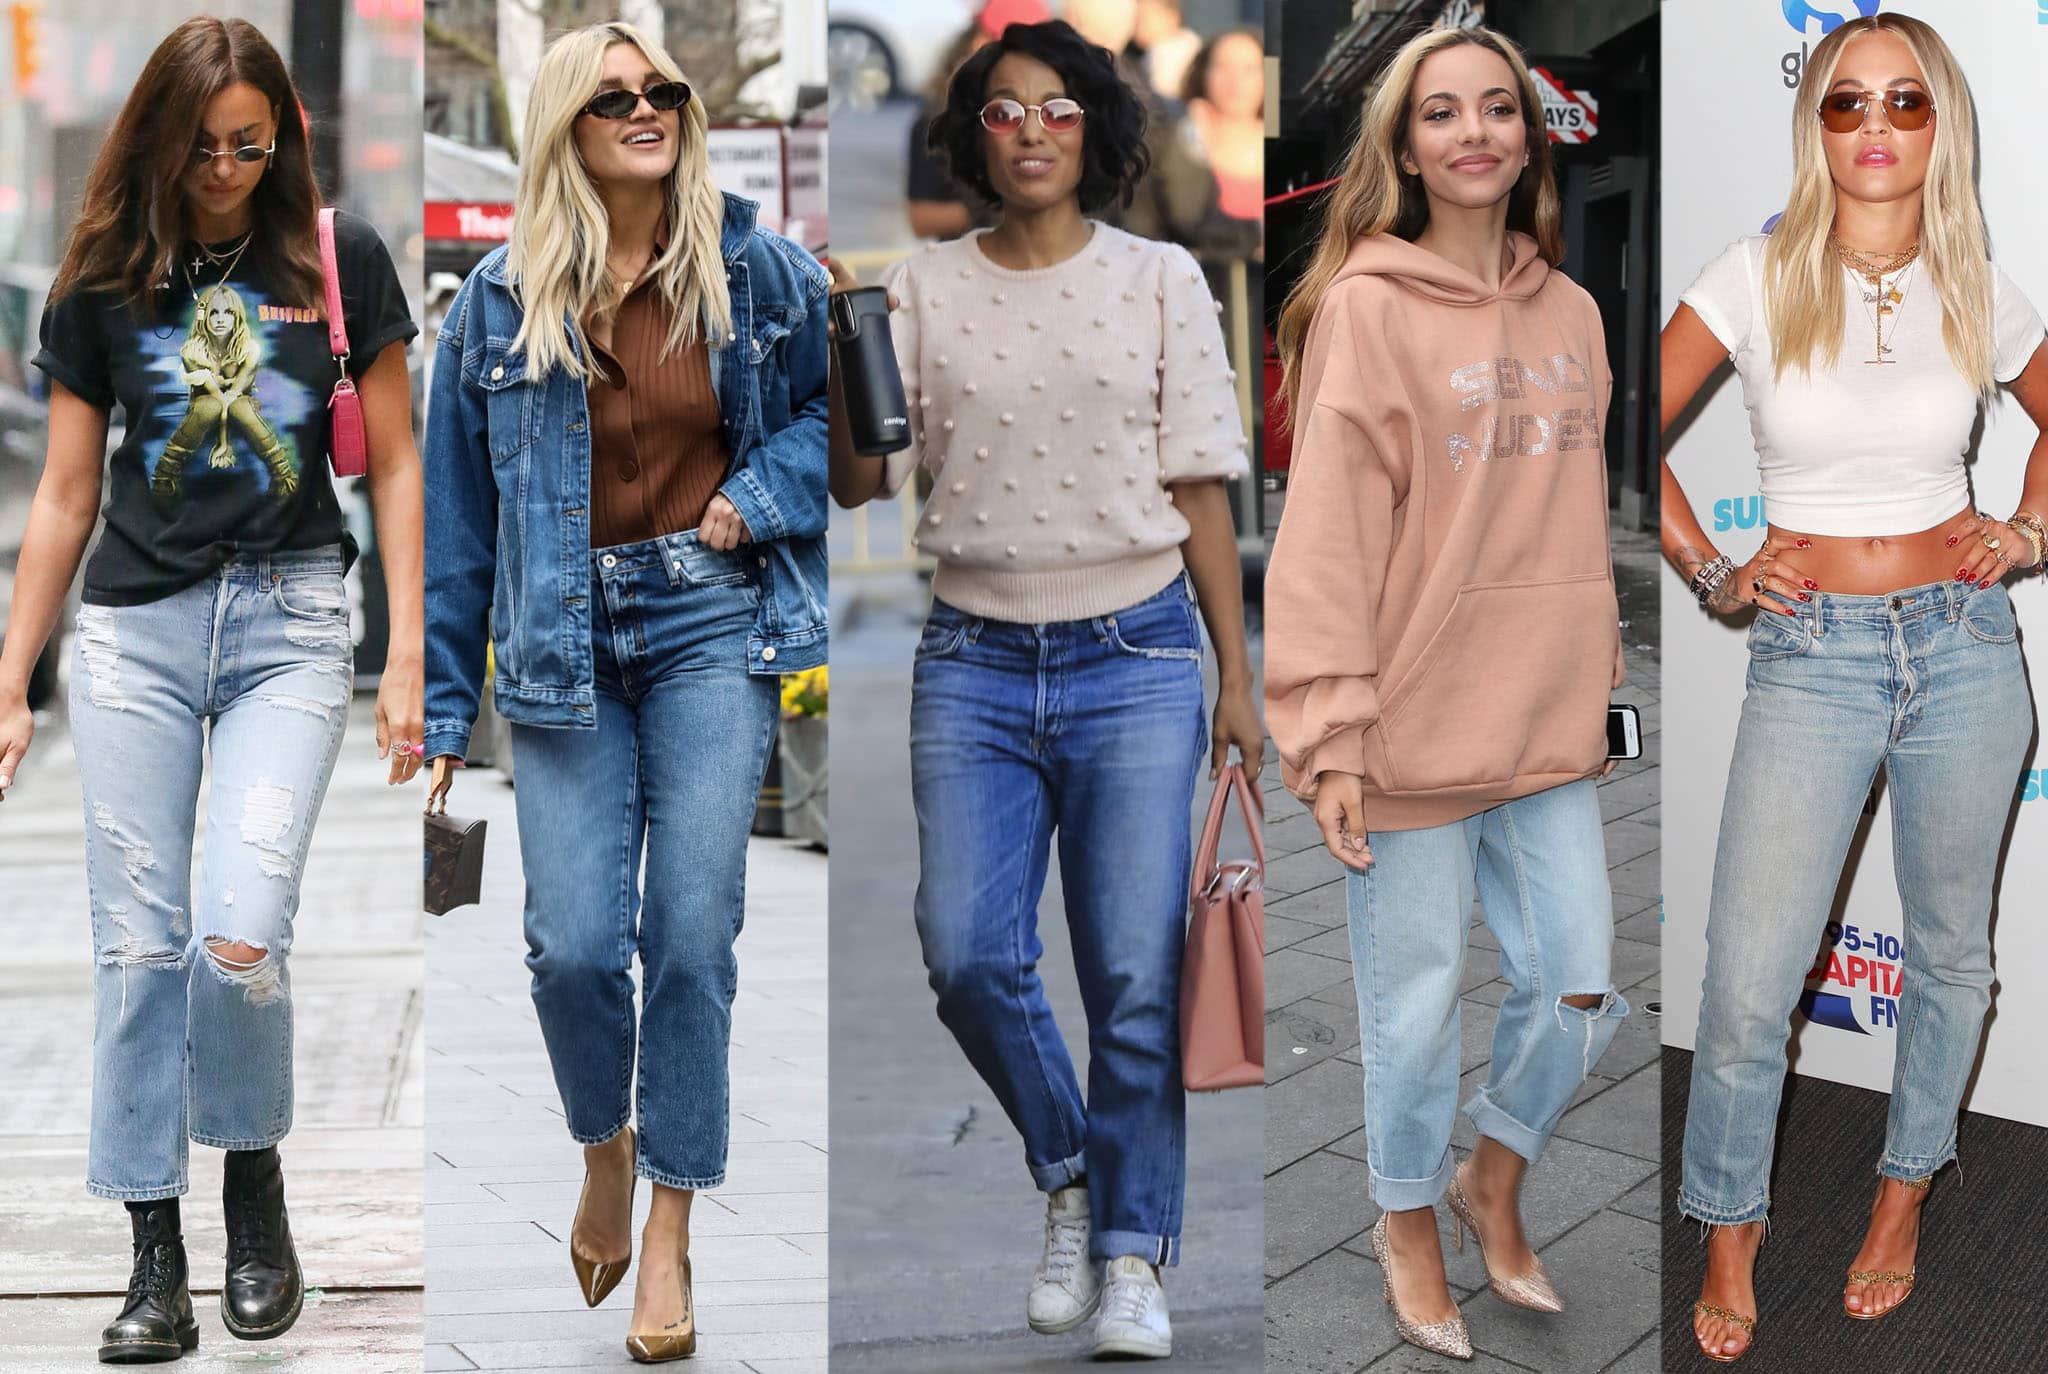 Irina Shayk, Ashley Roberts, Kerry Washington, Jade Thirlwall, and Rita Ora show how to style straight-leg jeans